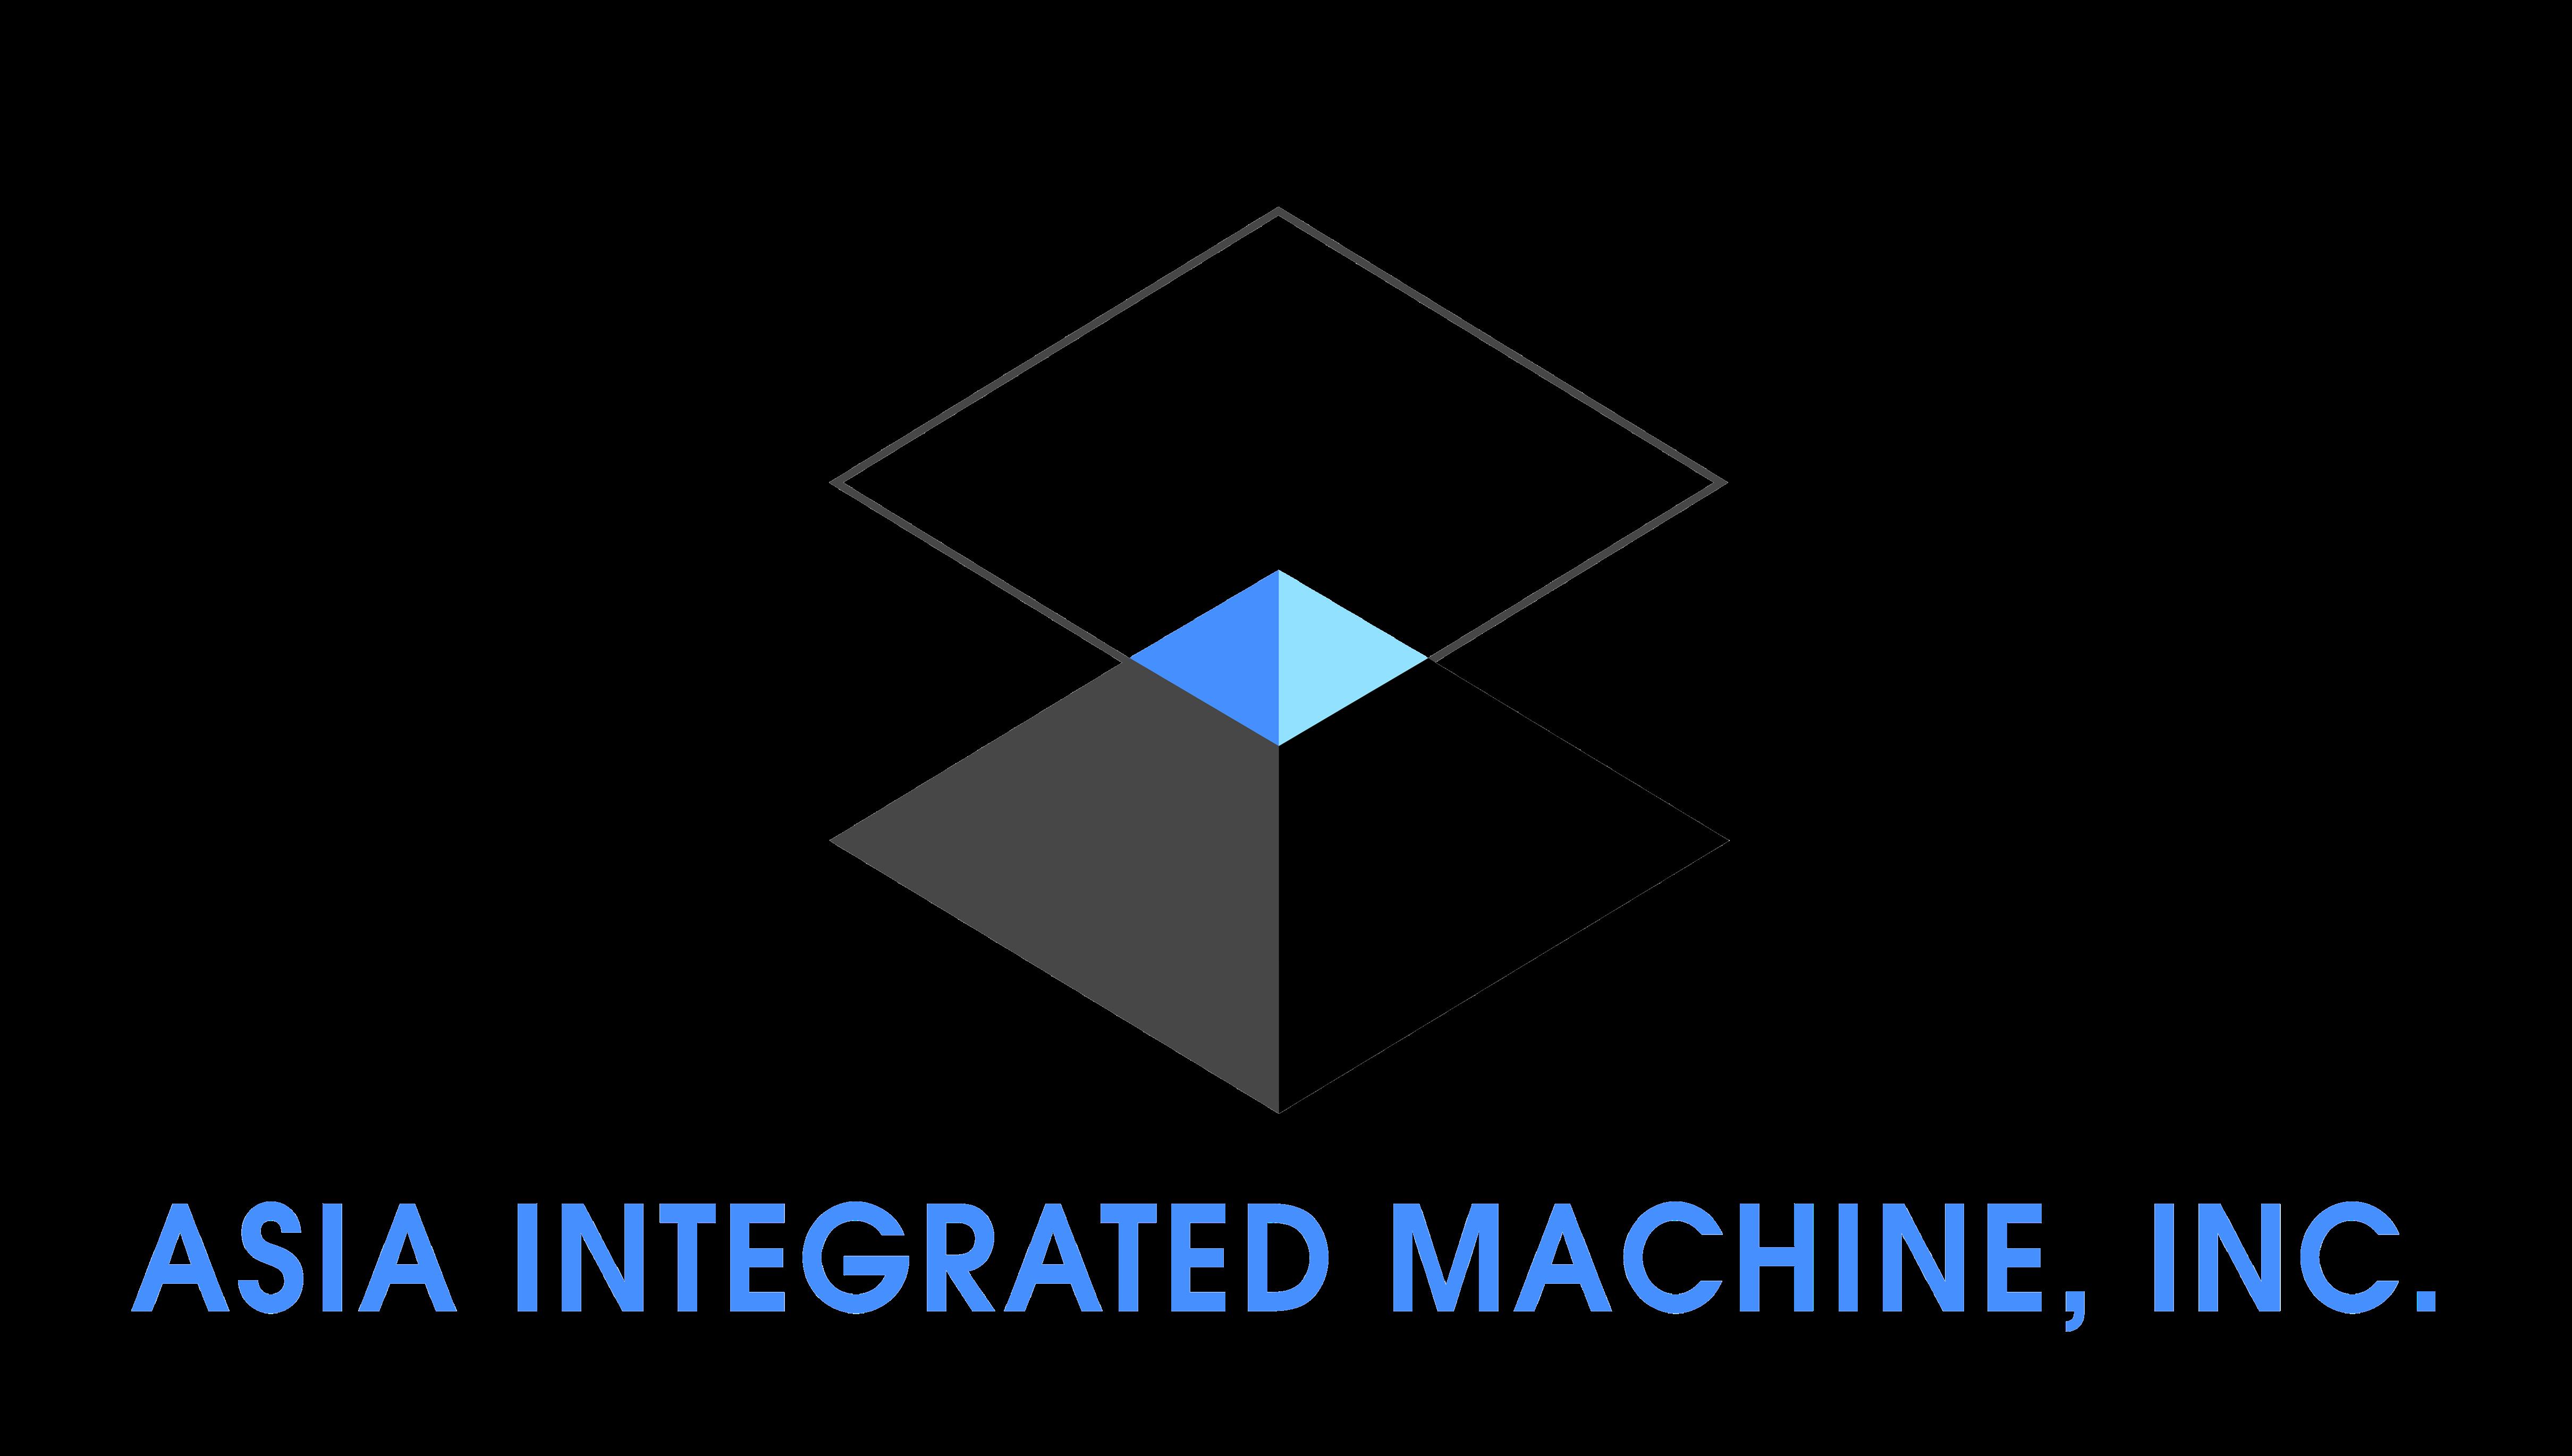 Asia Integrated Machine, Inc.